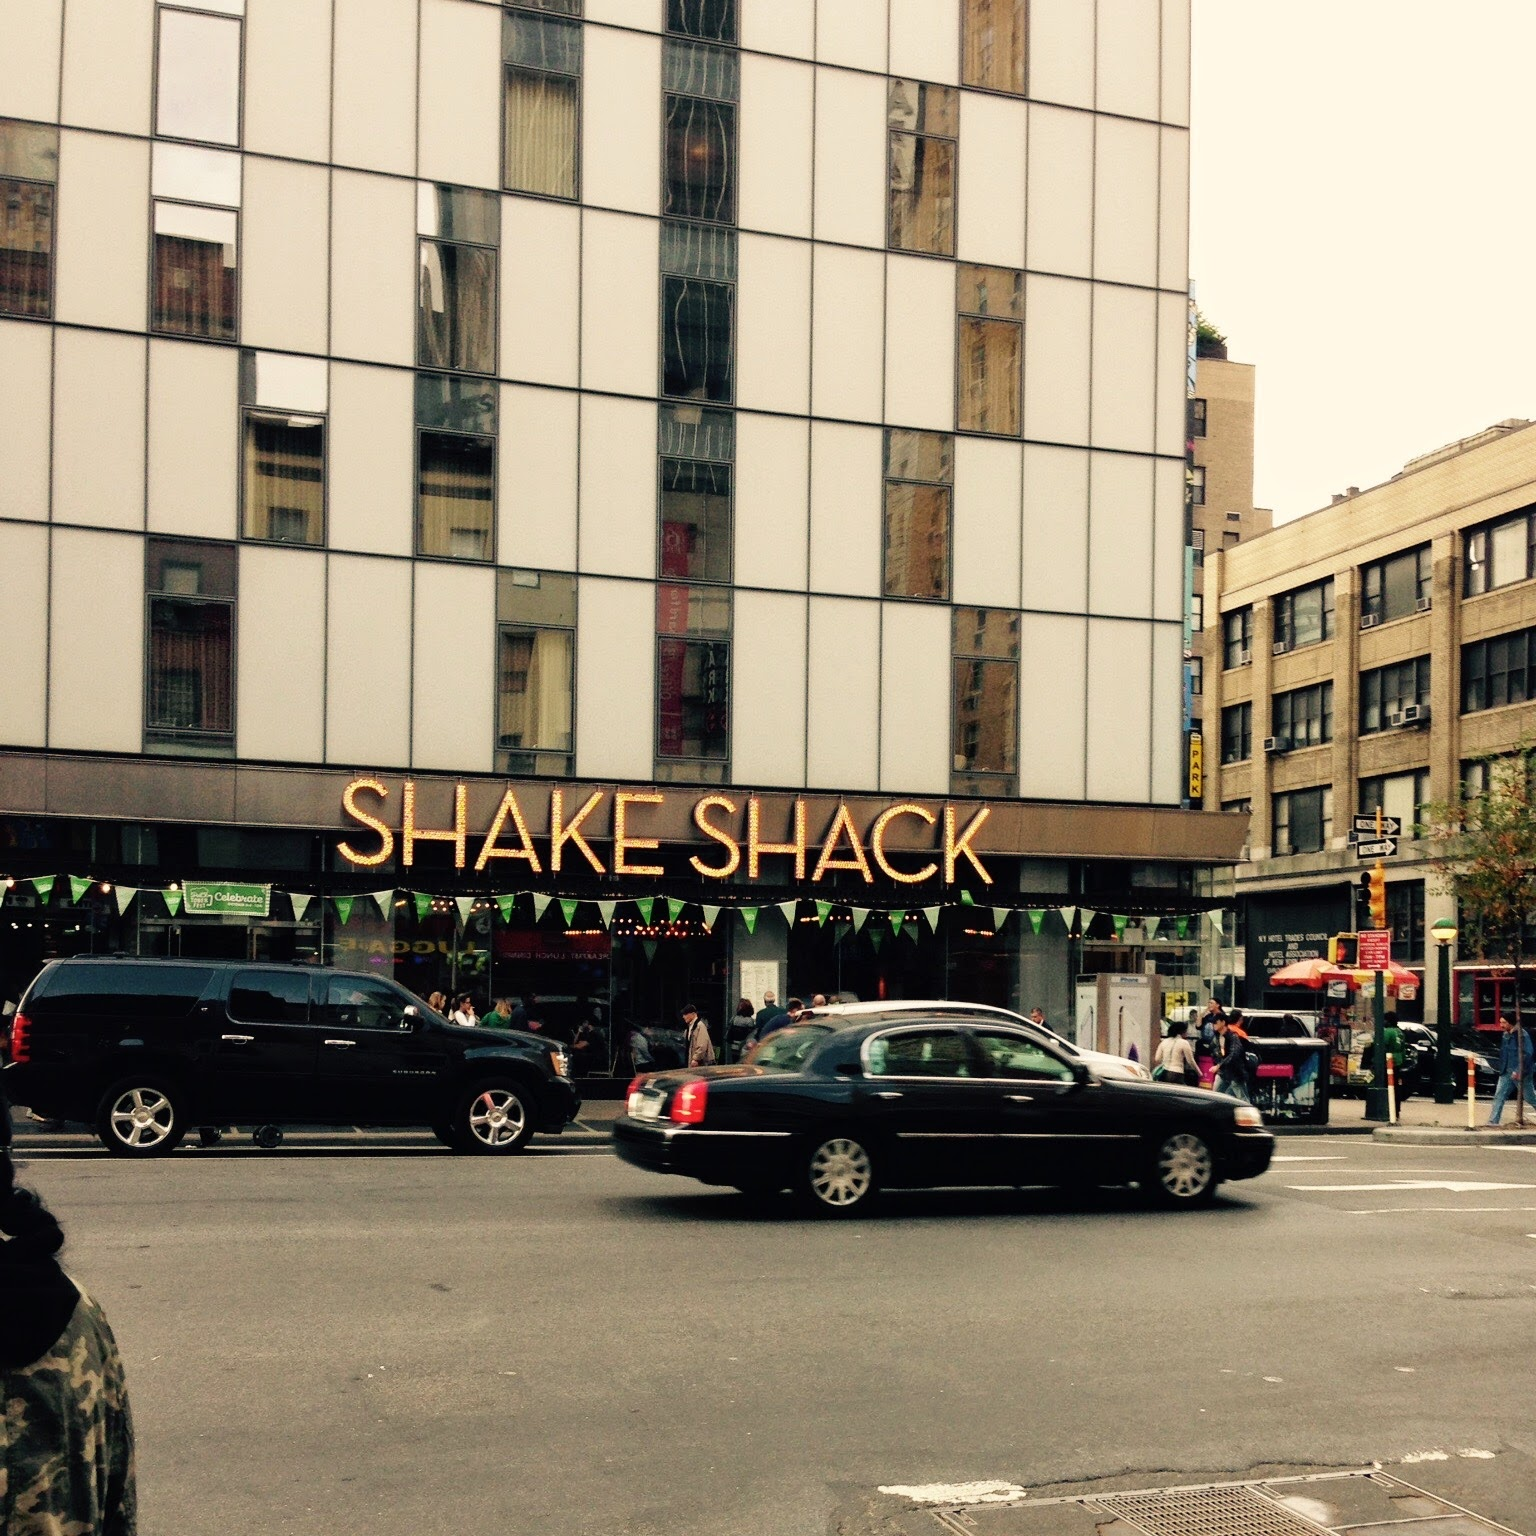 NY 10/2014° - Pour un burger façon fast but good: Shake Shack !